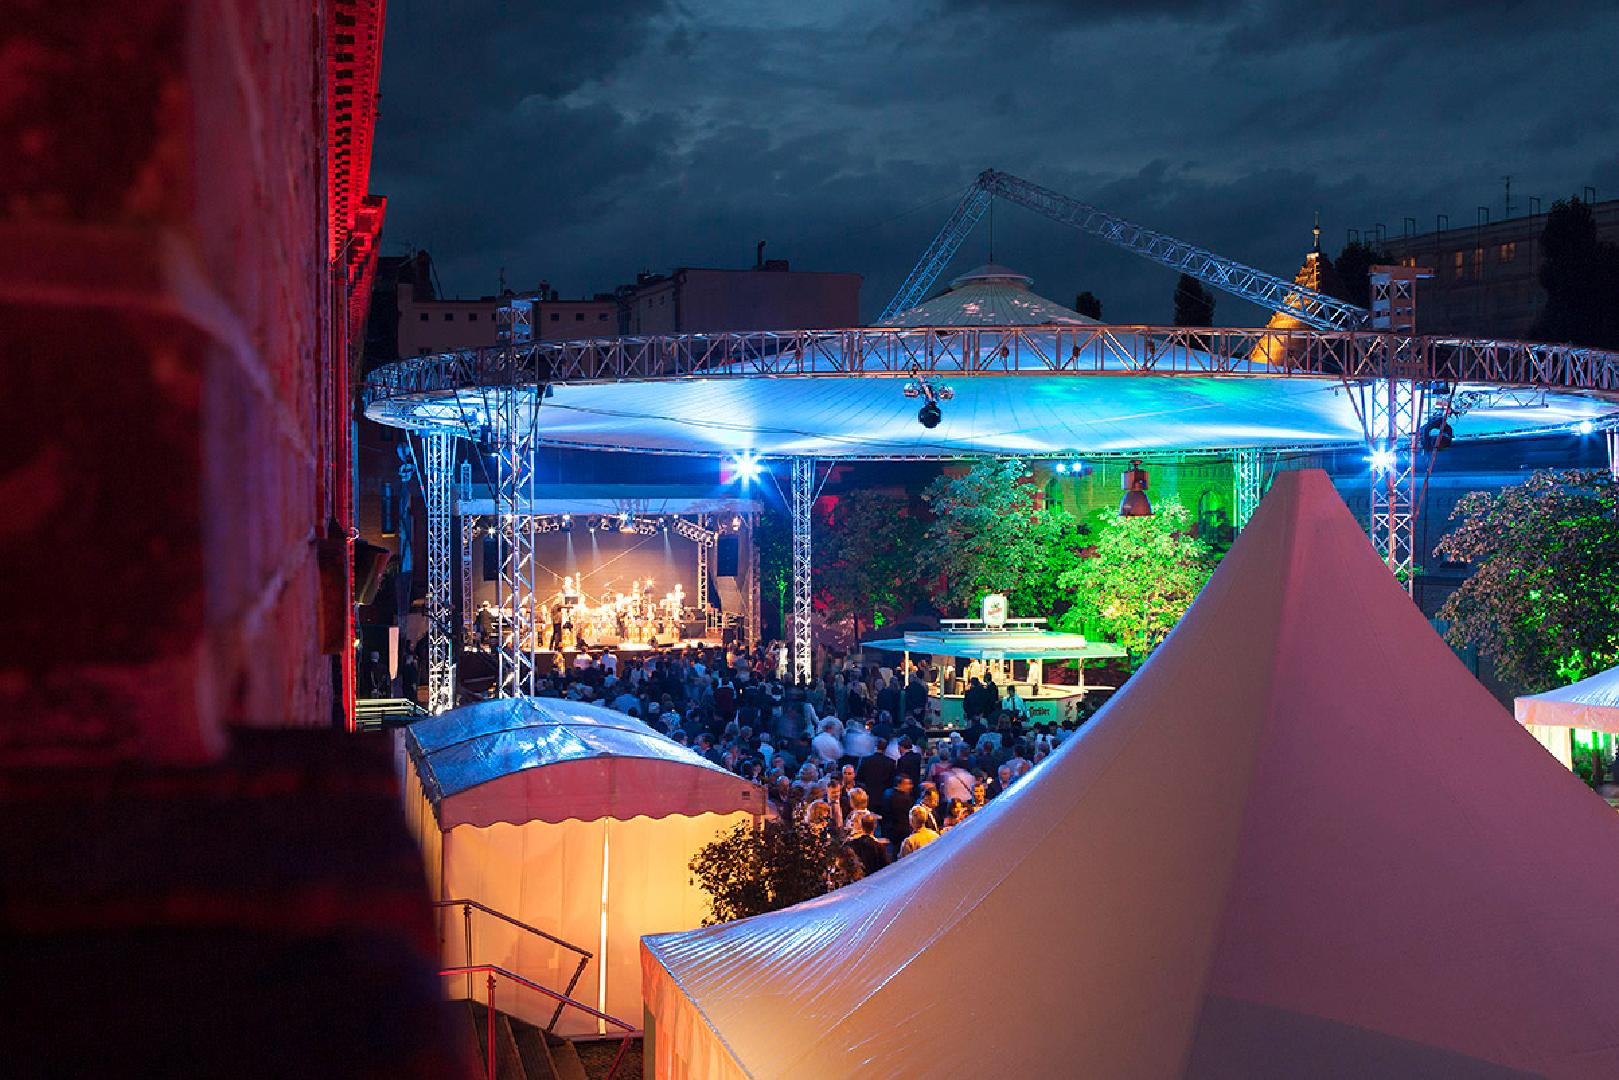 Kulturbrauerei Hof - Sommerfest mit Live Act